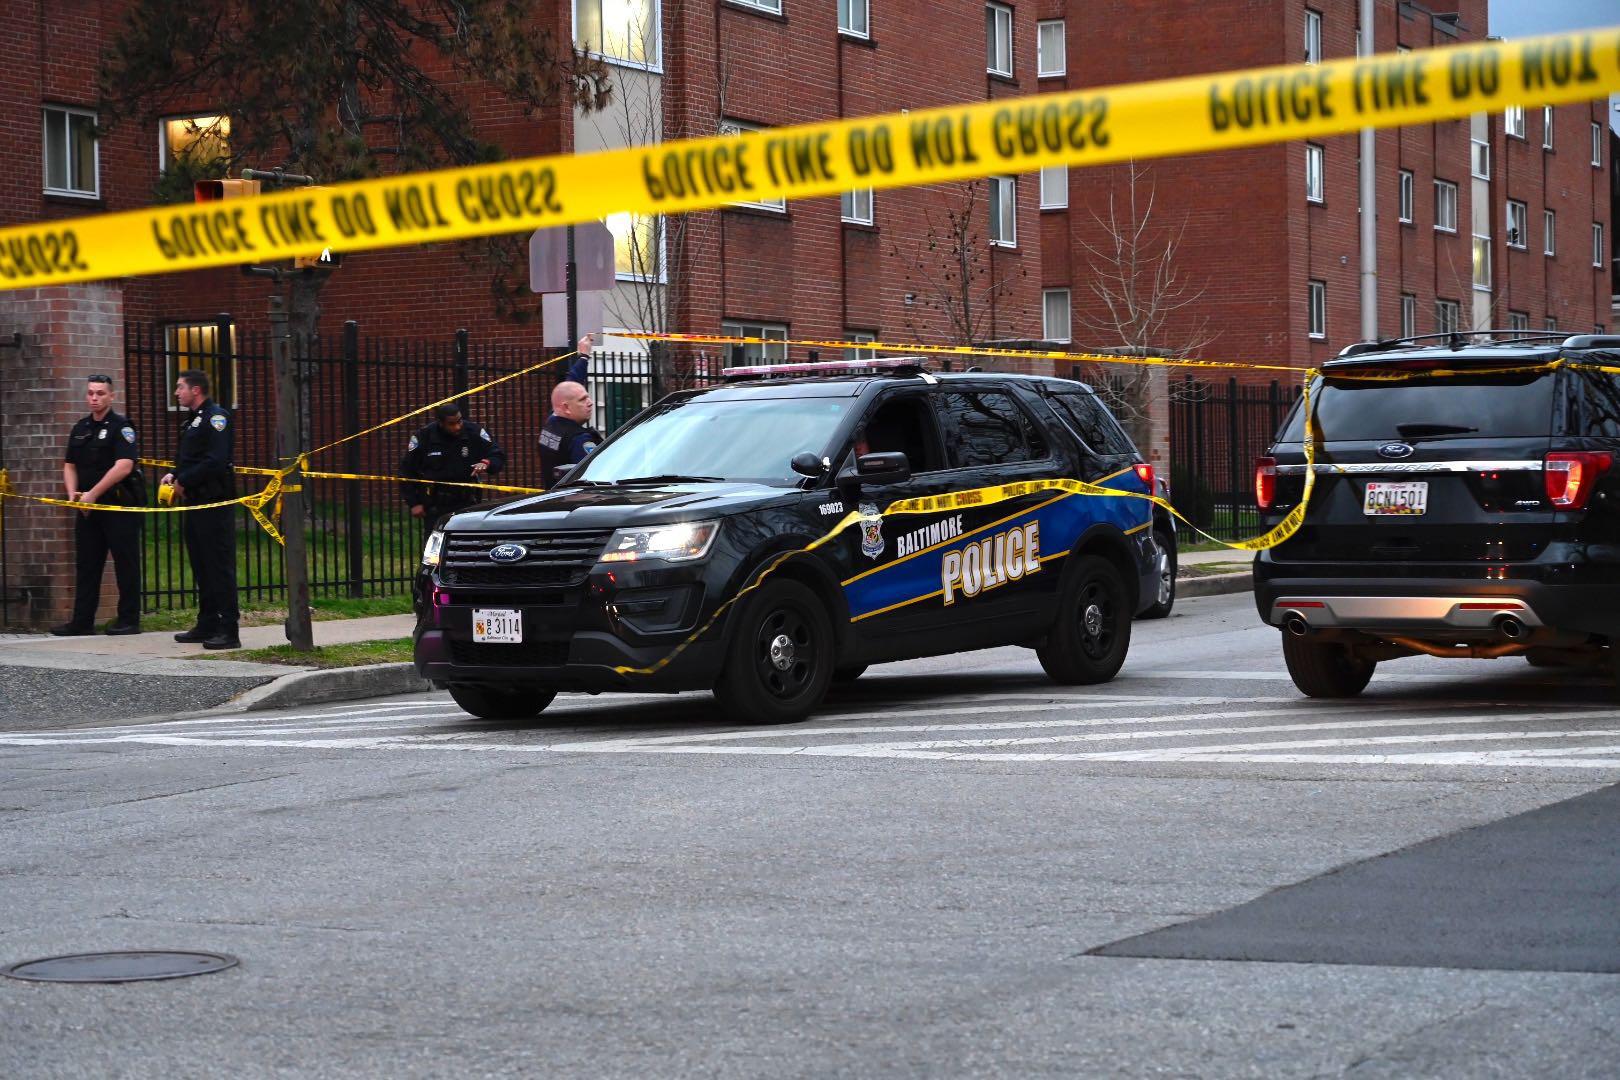 7 people shot near elementary school in Baltimore: police